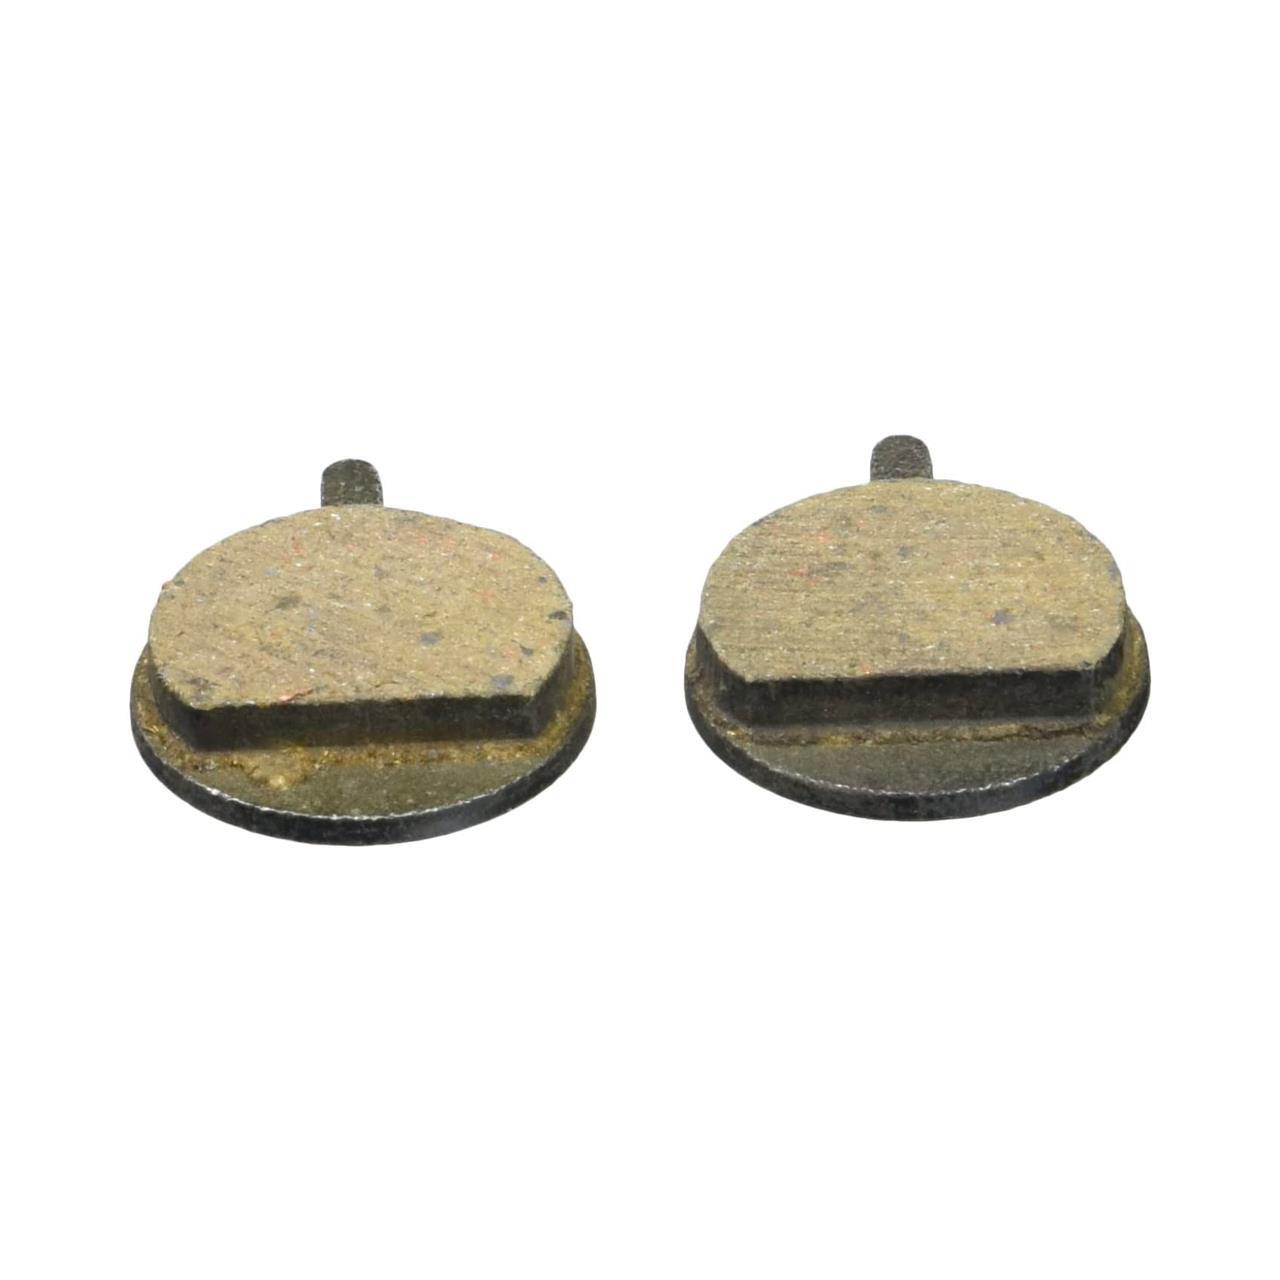 Clarks Organic Mechanical Disc Brake Pad (Fits CMD-8 and CMD-11)